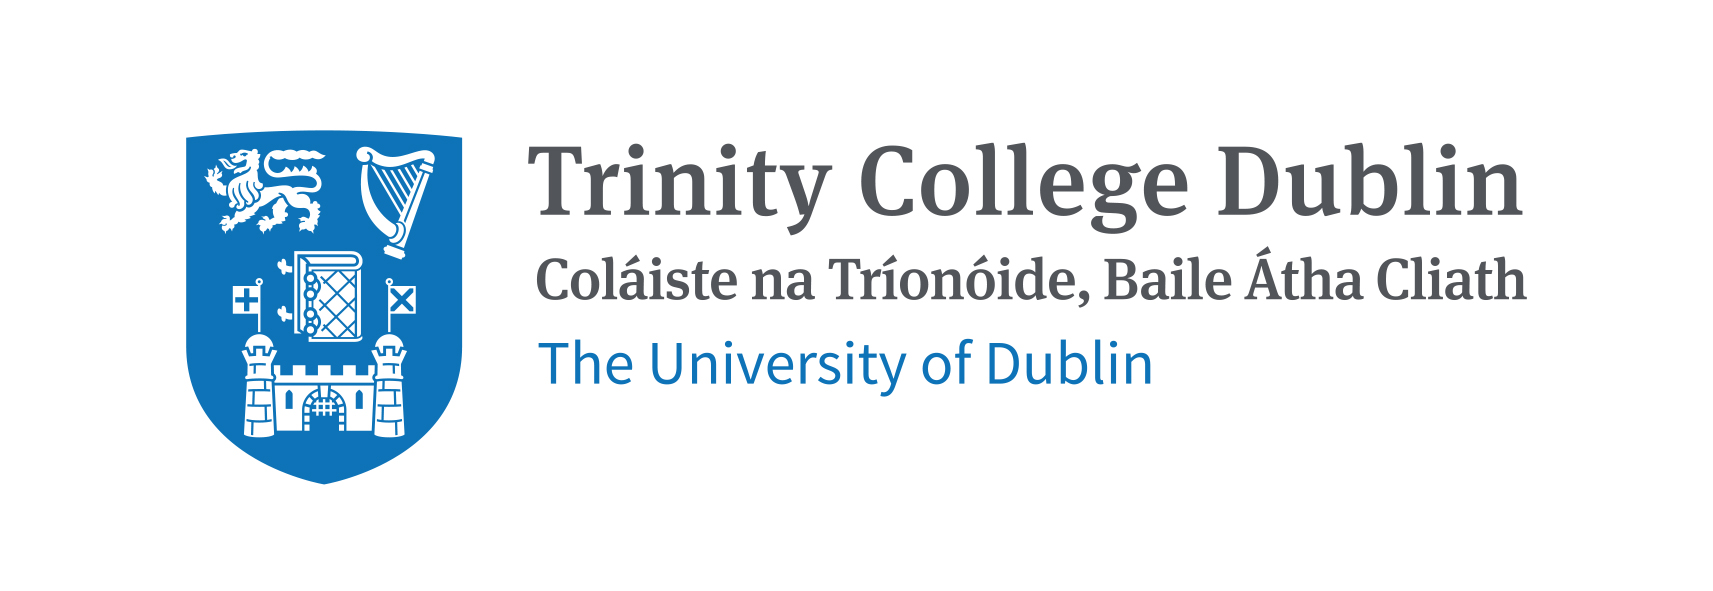 Identity trinity college dublin.